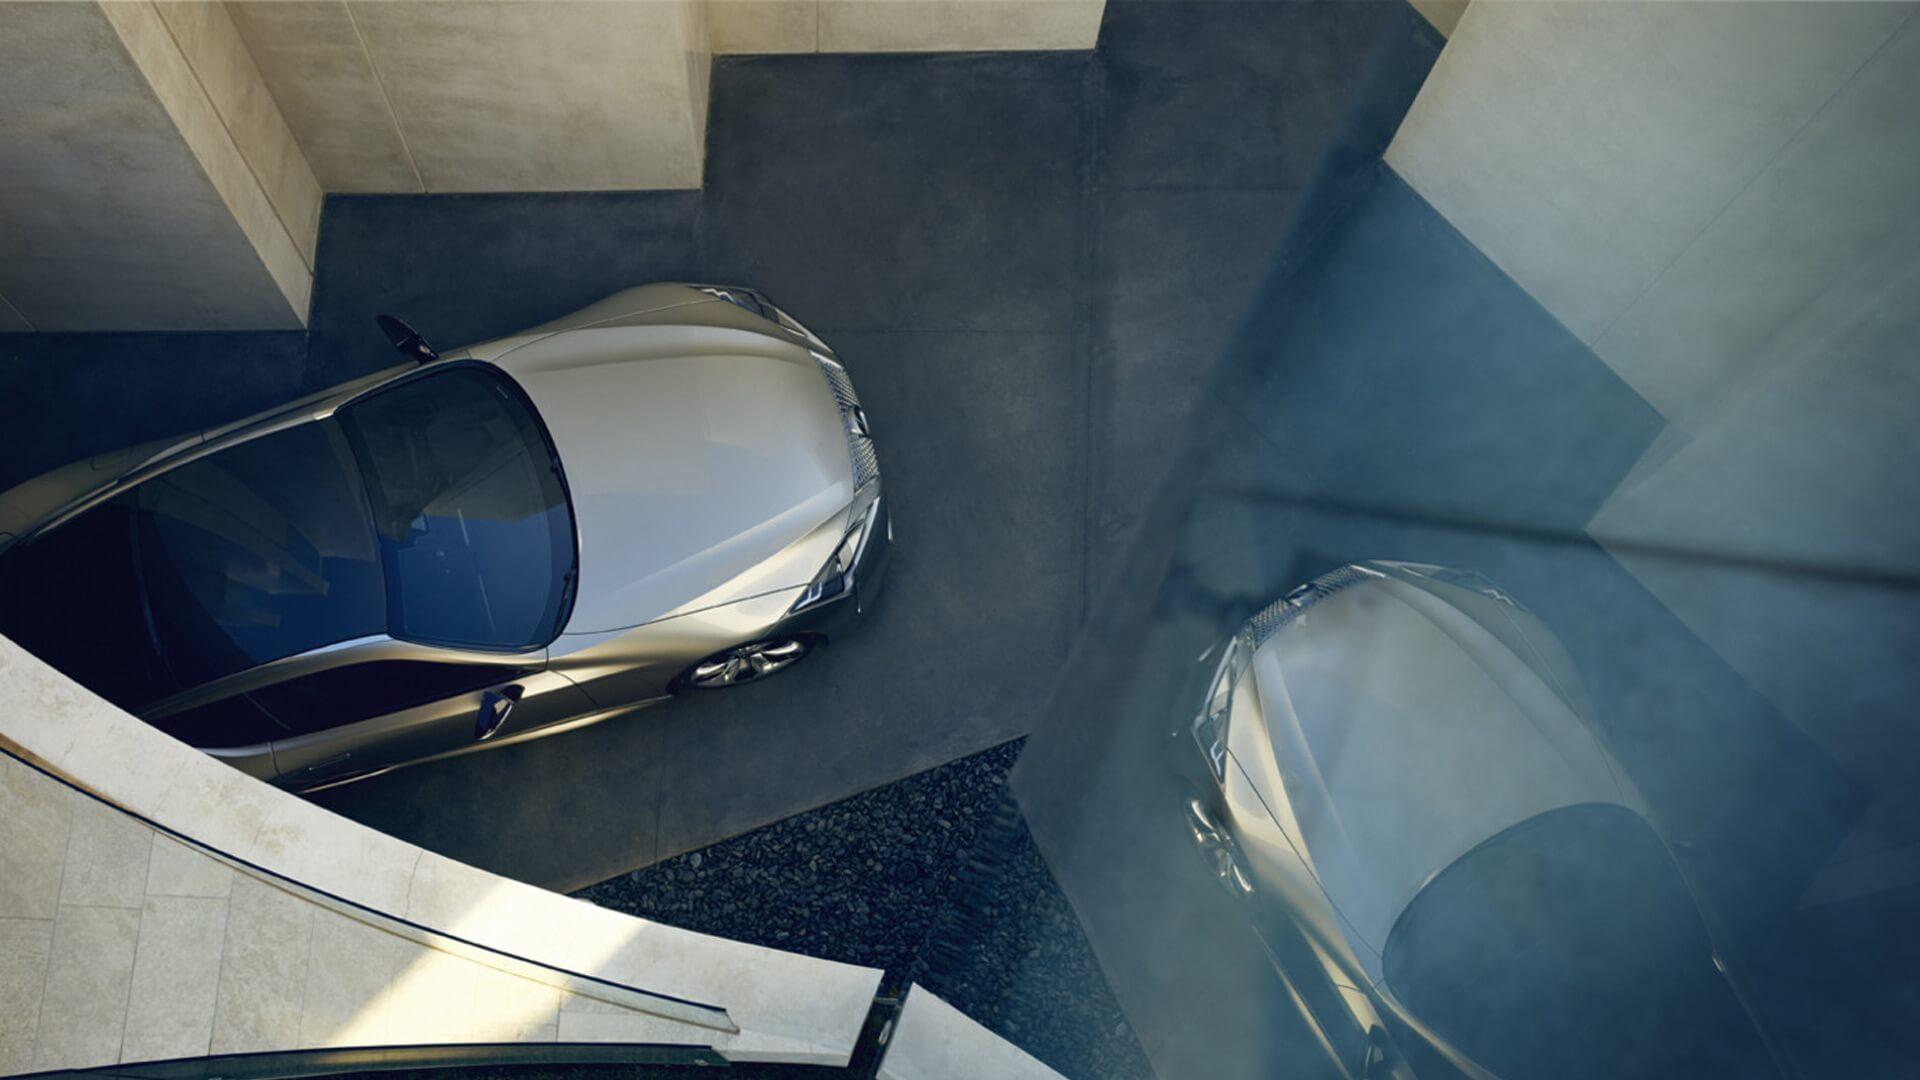 design provocative perspectives Next Steps